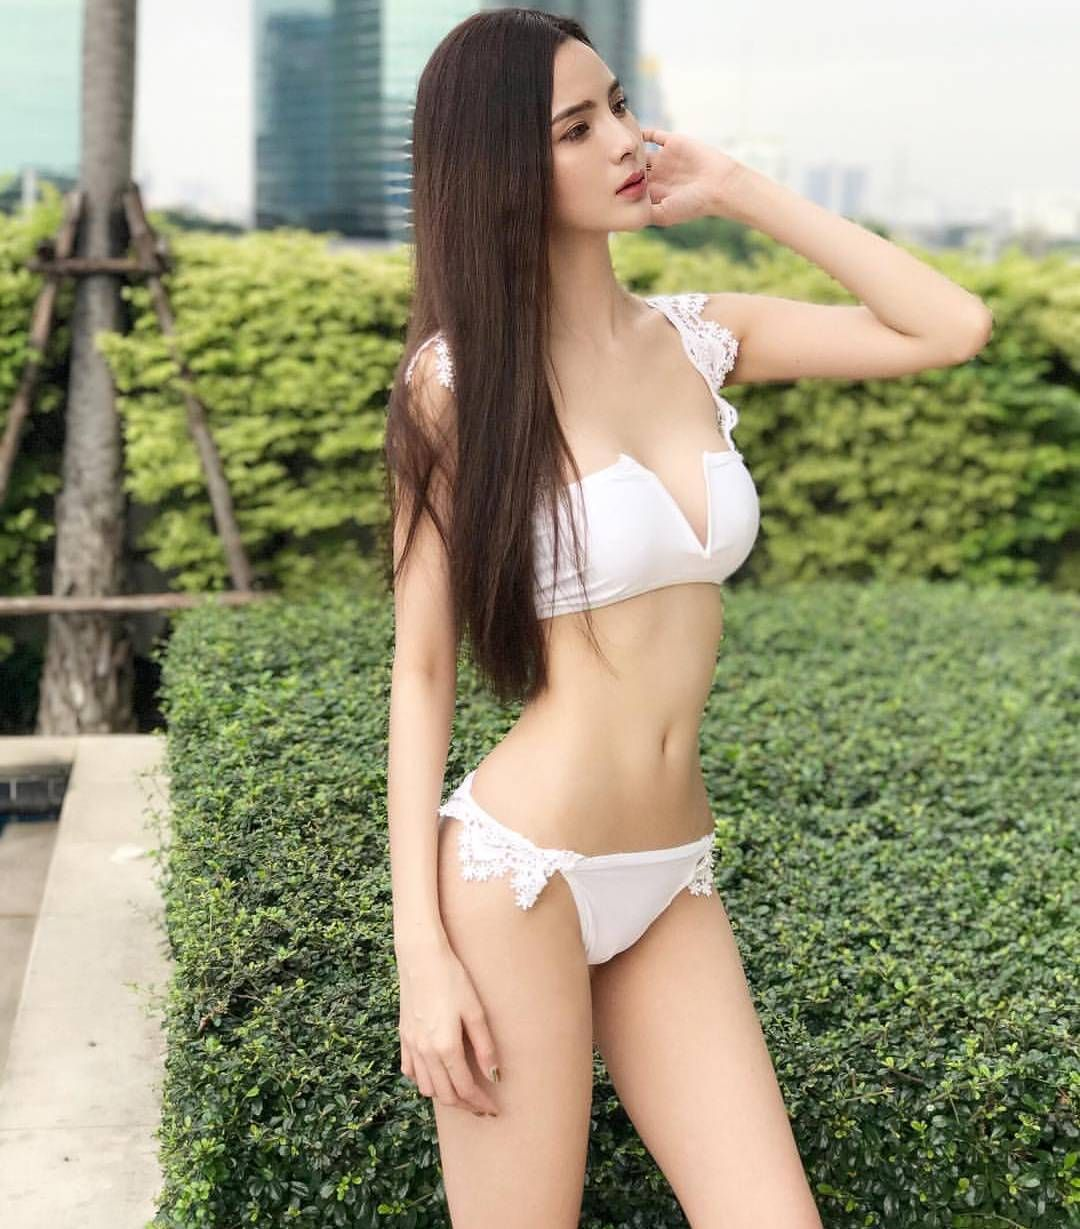 congratulate, this idea jane fonda as barbarella nude the expert, can